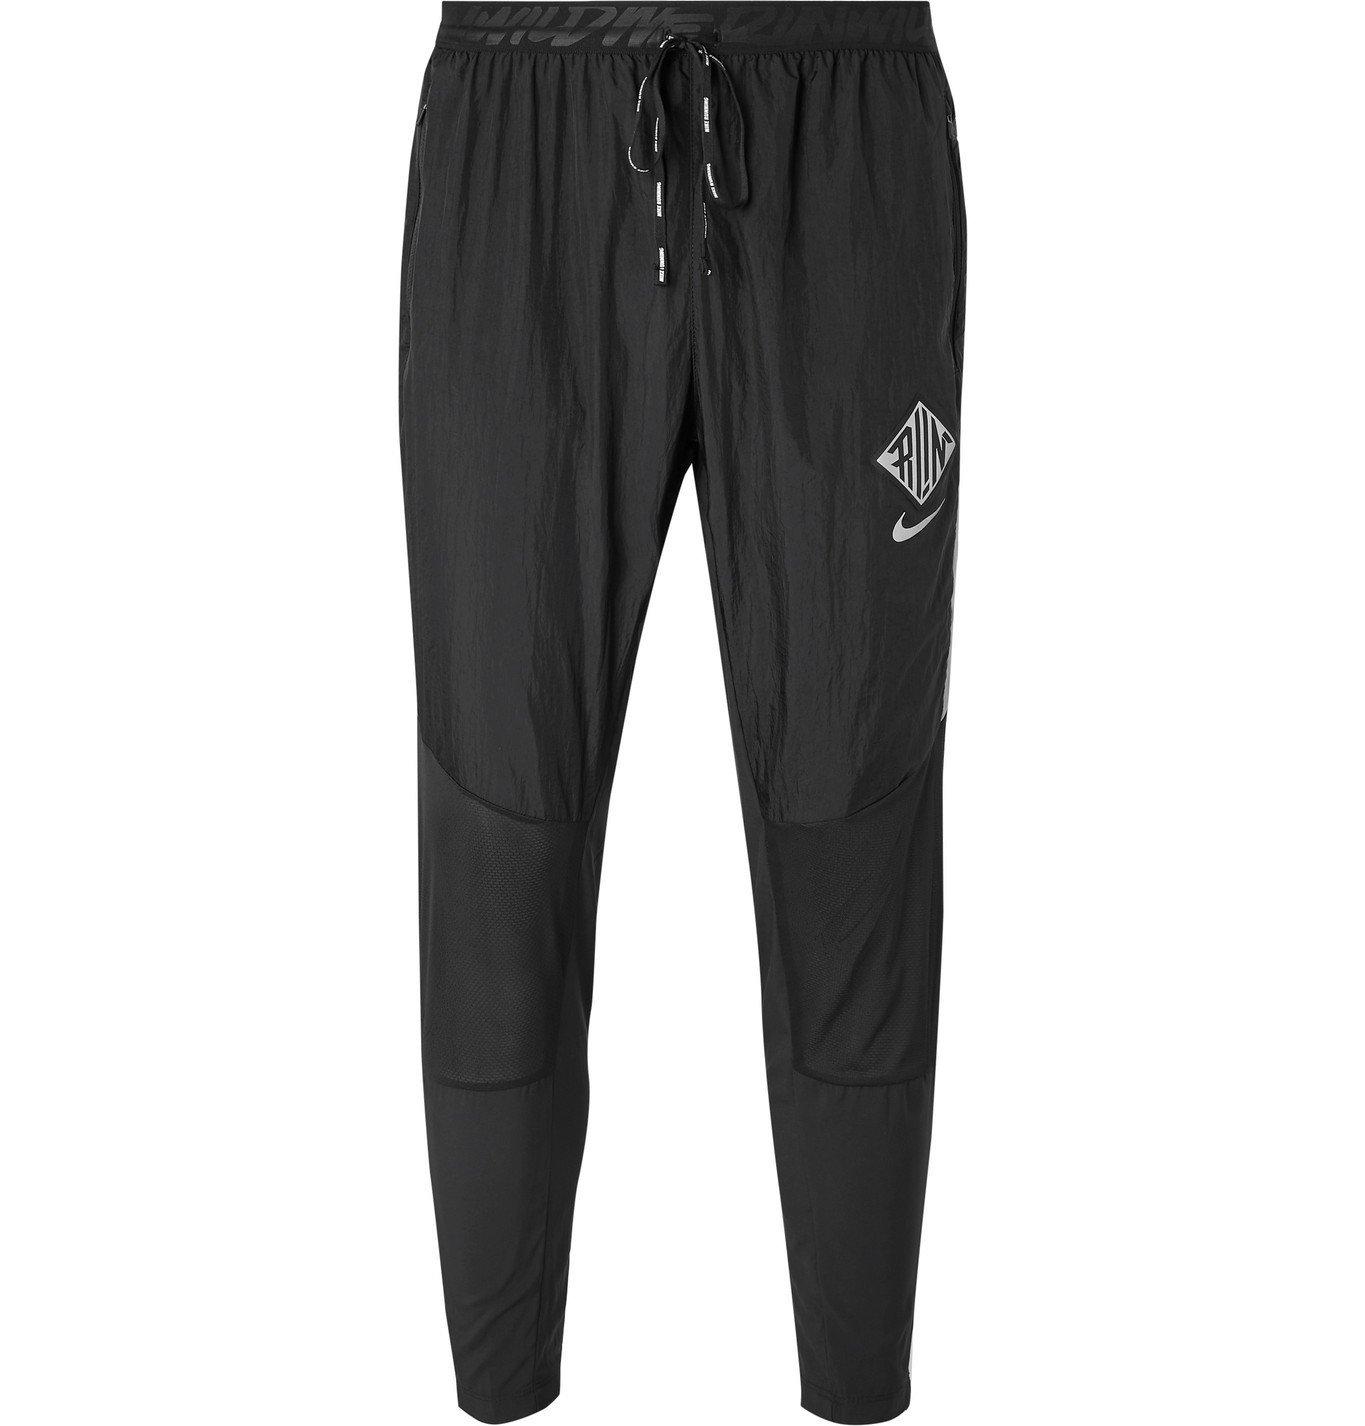 Nike Running - Phenom Elite Tapered Mesh-Panelled Shell Sweatpants - Black